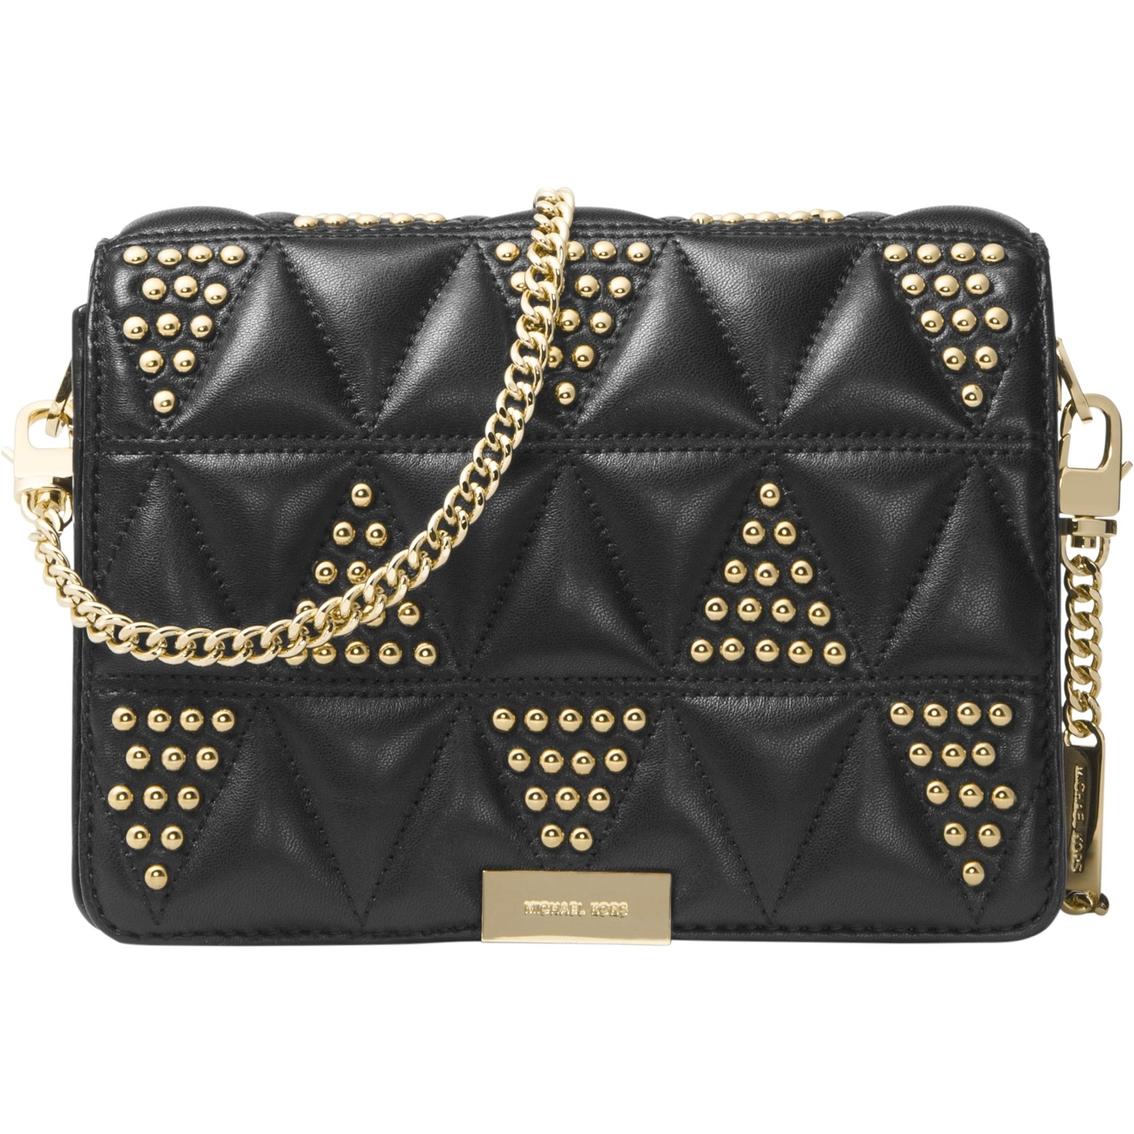 d7981ea51e6ccb Michael Kors Jade Medium Gusset Clutch | Handbags | Shop The Exchange